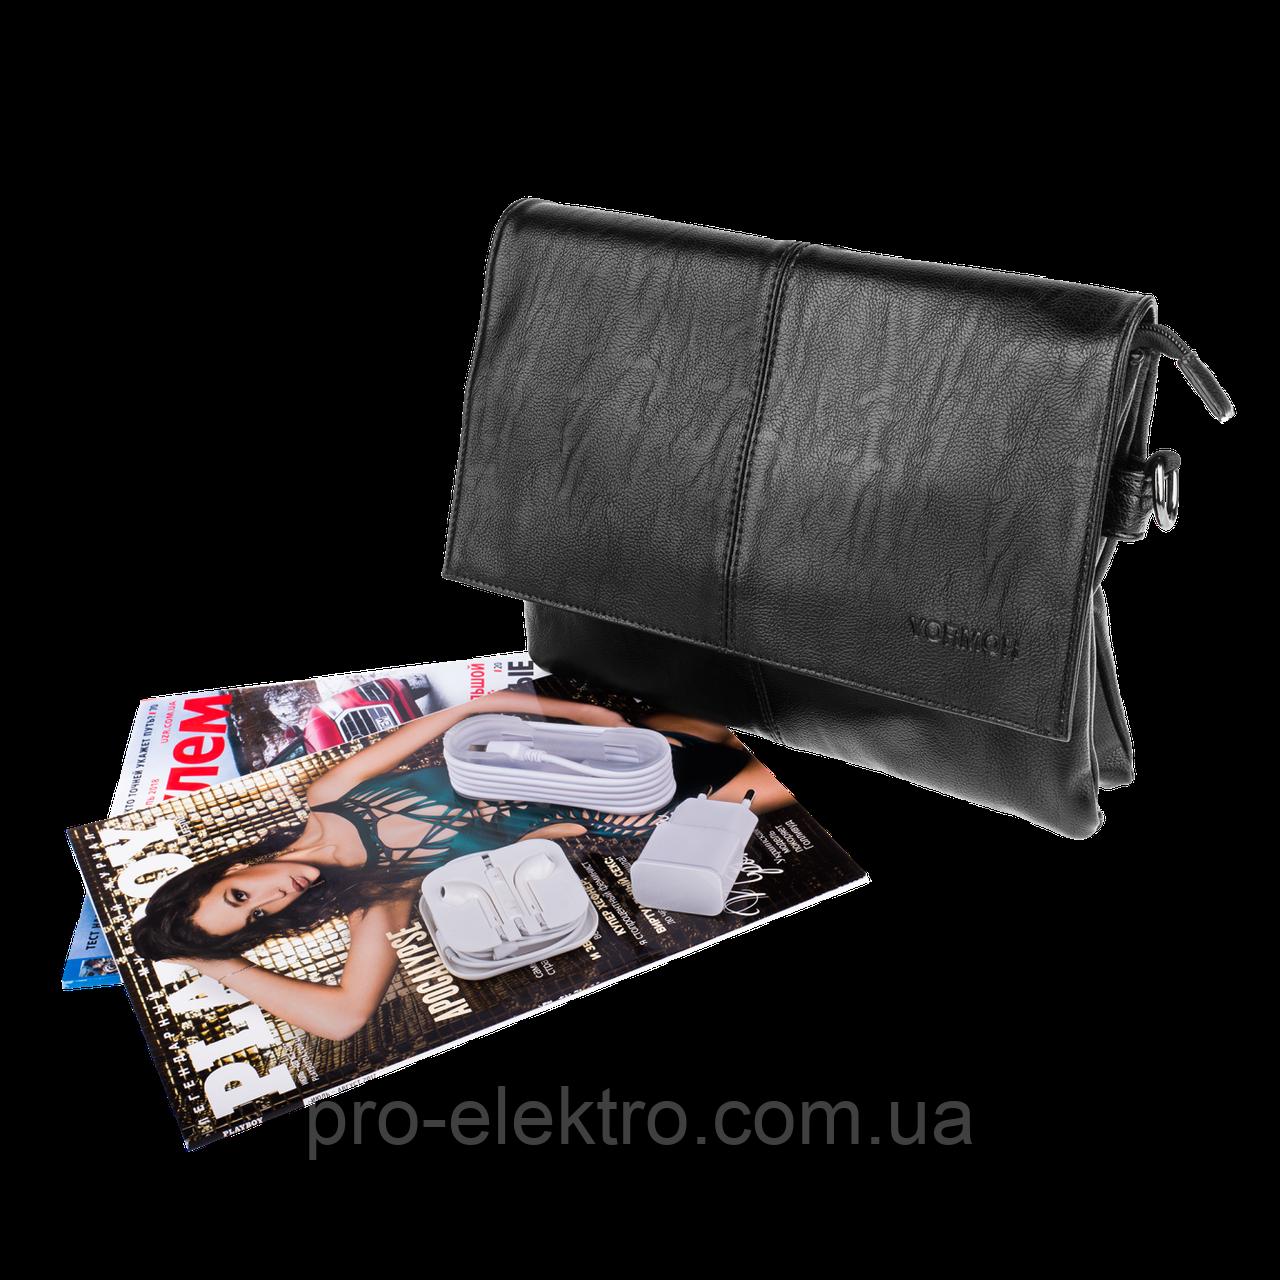 Сумка чоловіча Vormor A003-V6002BLACK